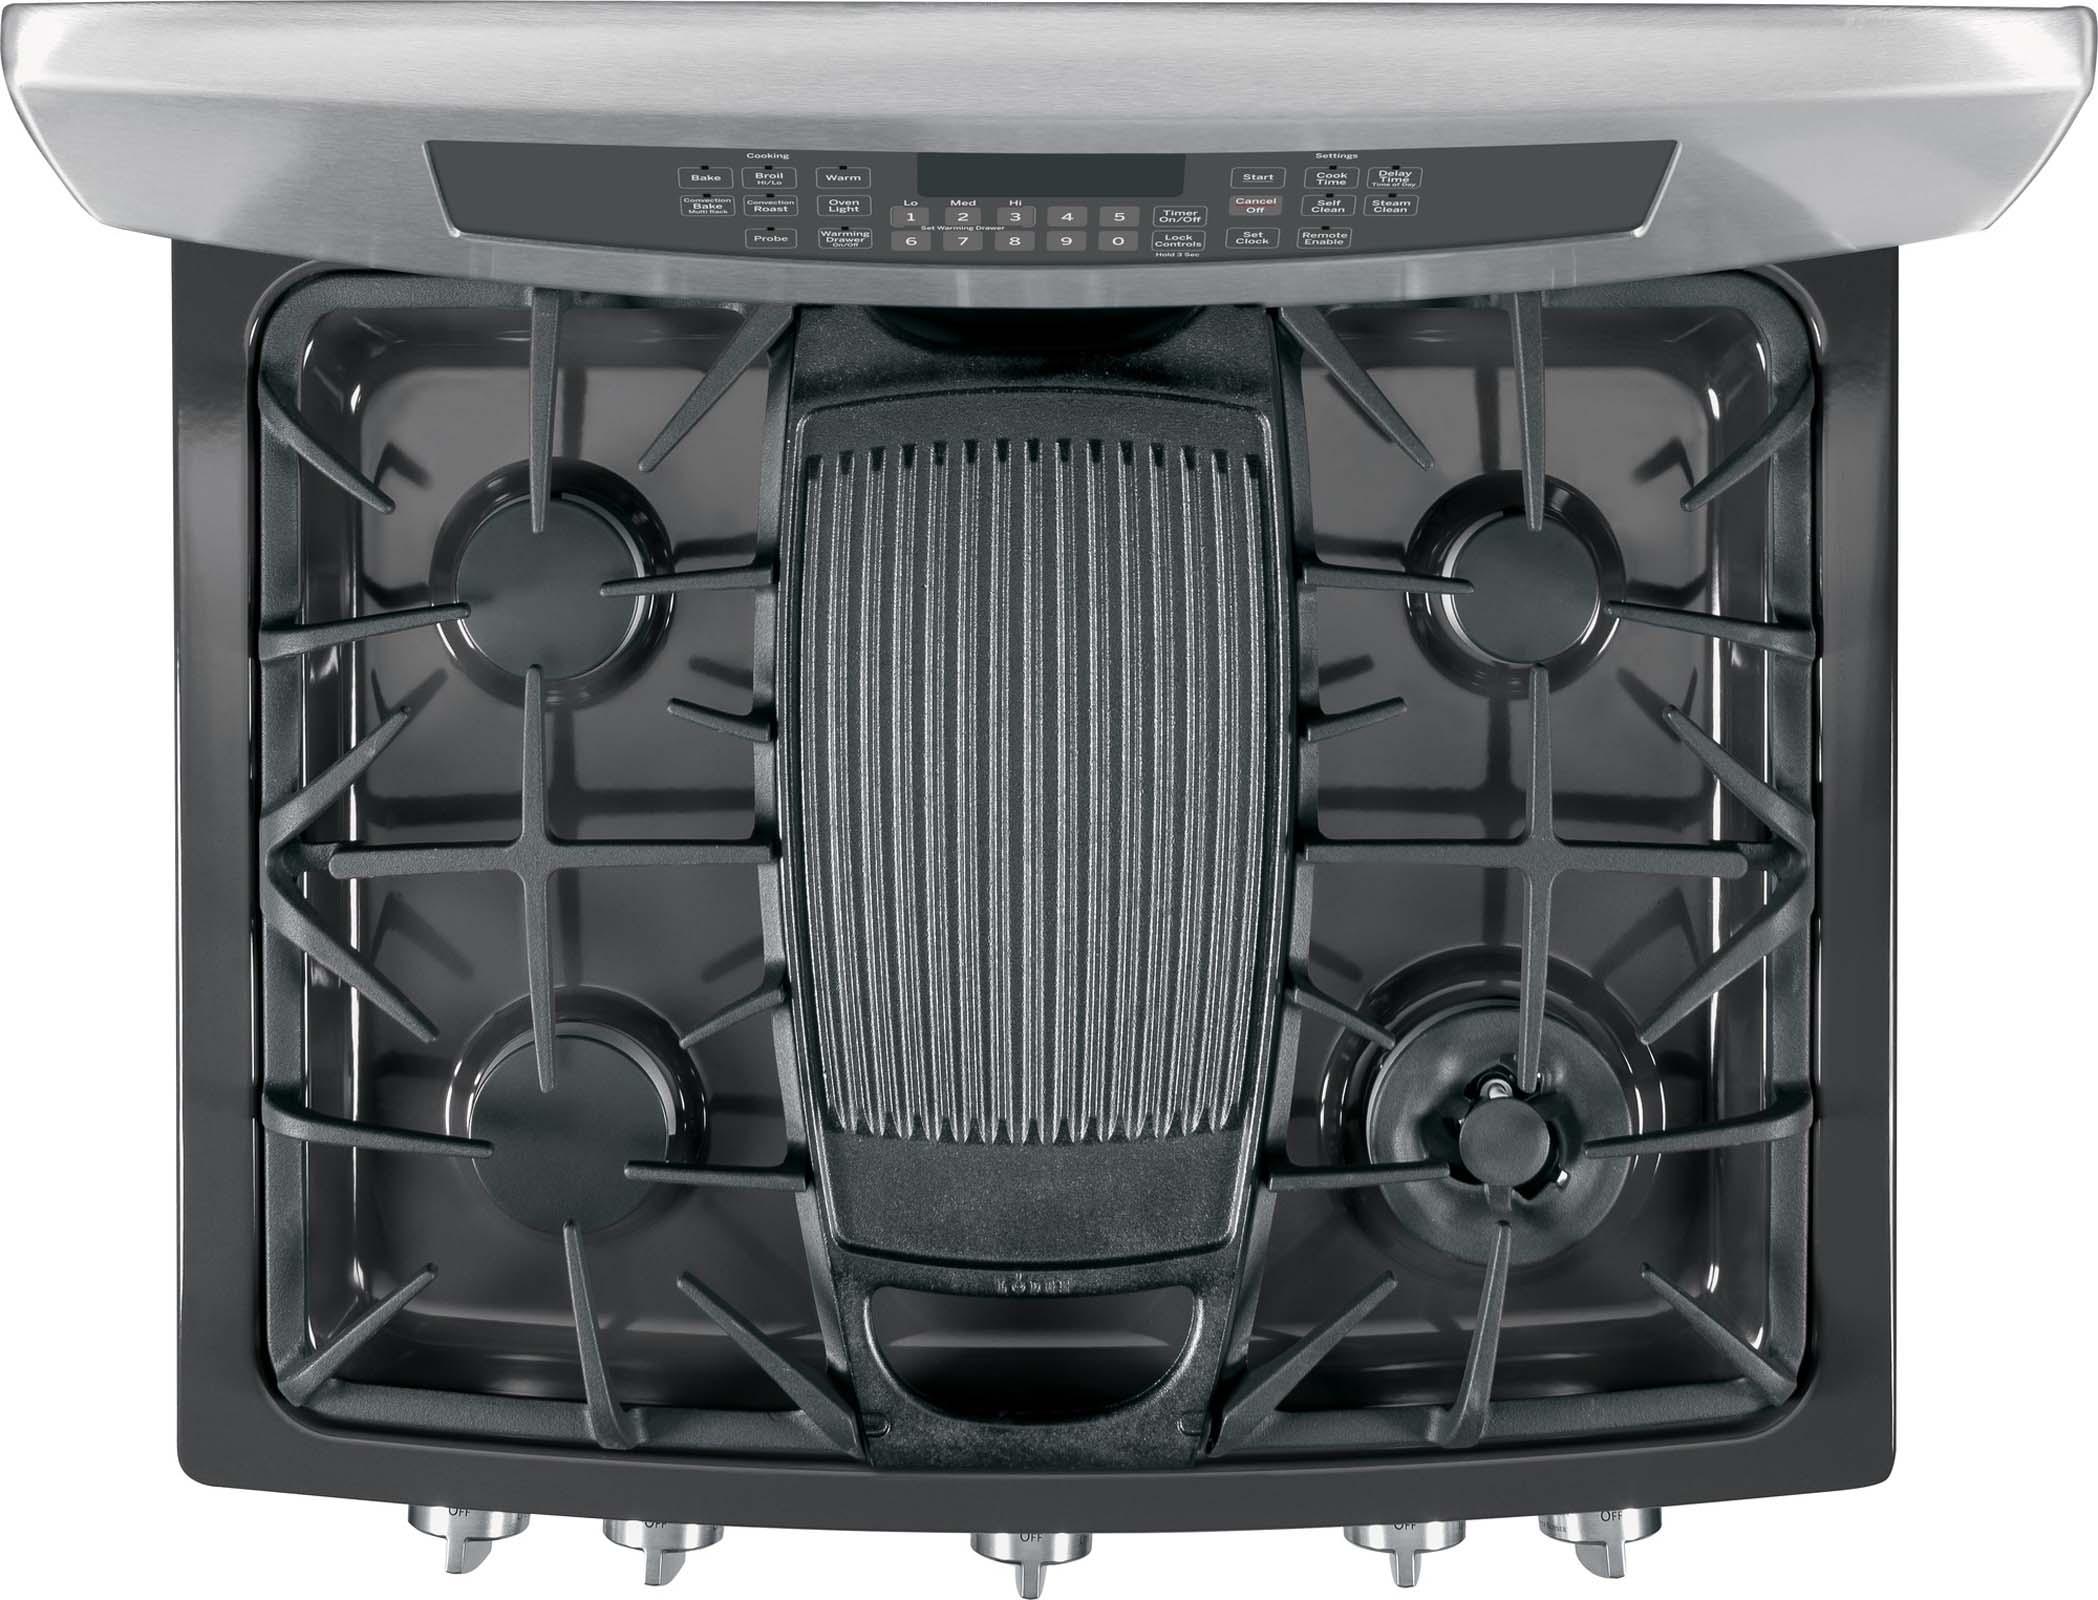 GE Profile 5.6 cu. ft. Free-Standing Self-Clean Gas Range w/ Warming Drawer - Stainless Steel